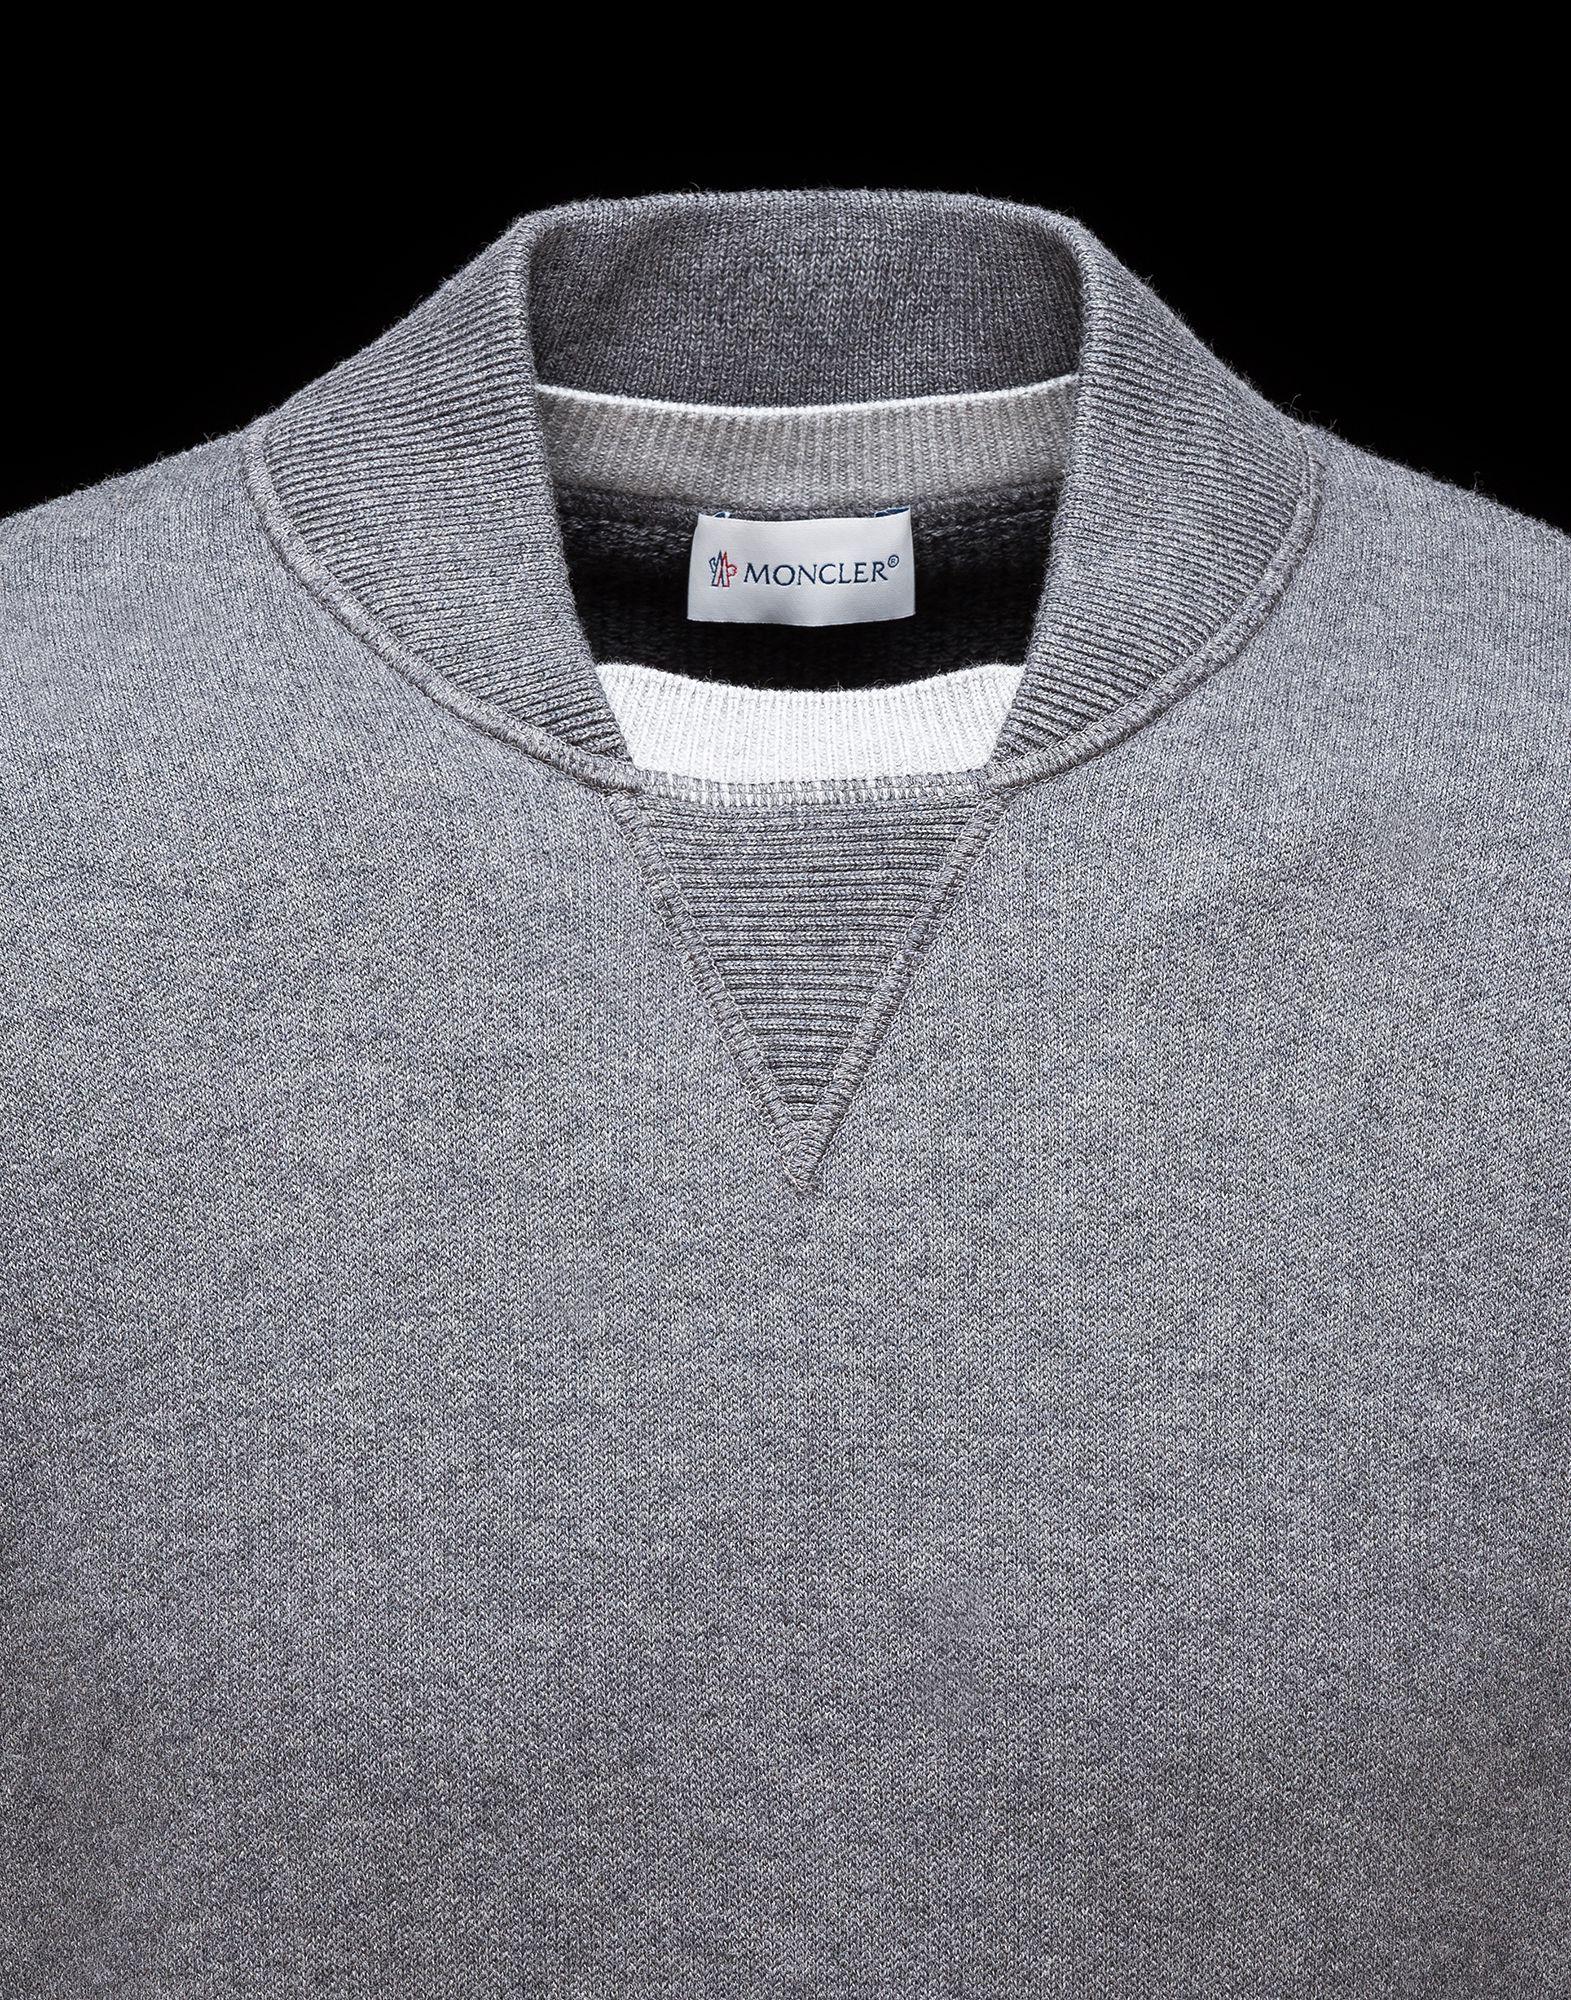 3978438034c7 MONCLER COLLAR Sportswear Man, Sweat Shirt, Polo Shirt, Men Design, Men s  Sweaters